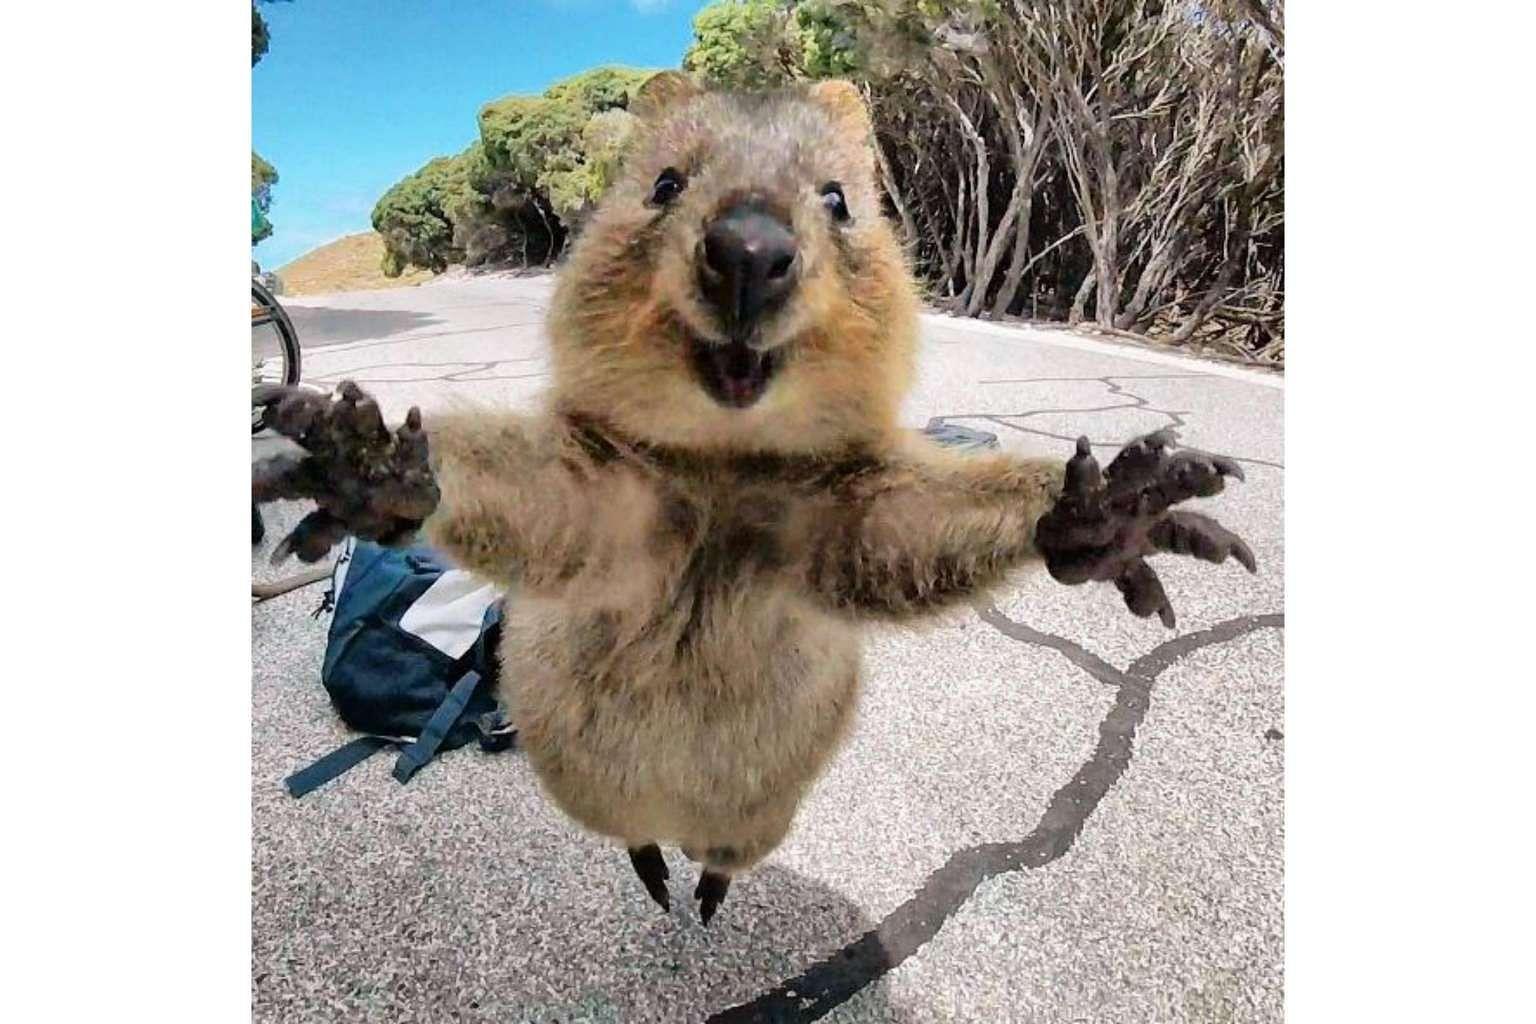 Smiling 'hug me' quokka in Australia is Instagram's latest darling,  Australia/NZ News & Top Stories - The Straits Times